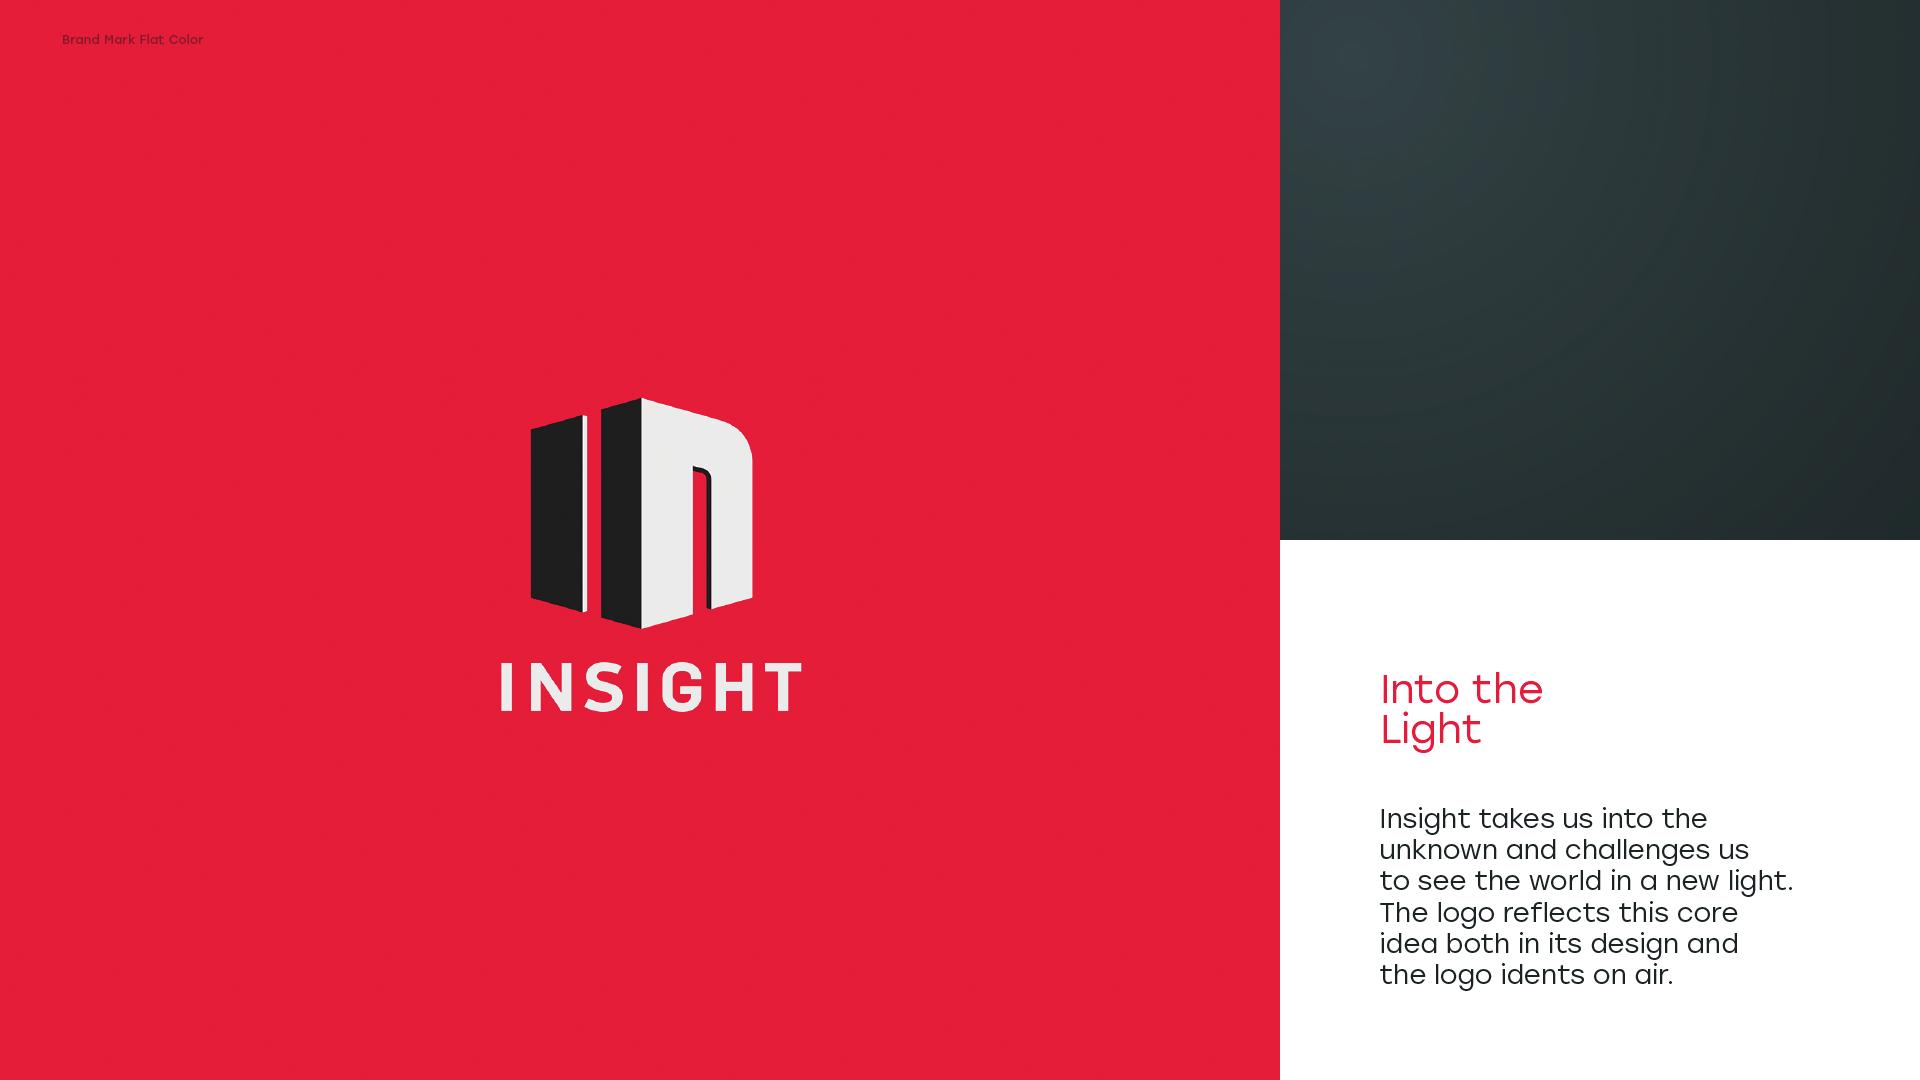 Insight Into the Light